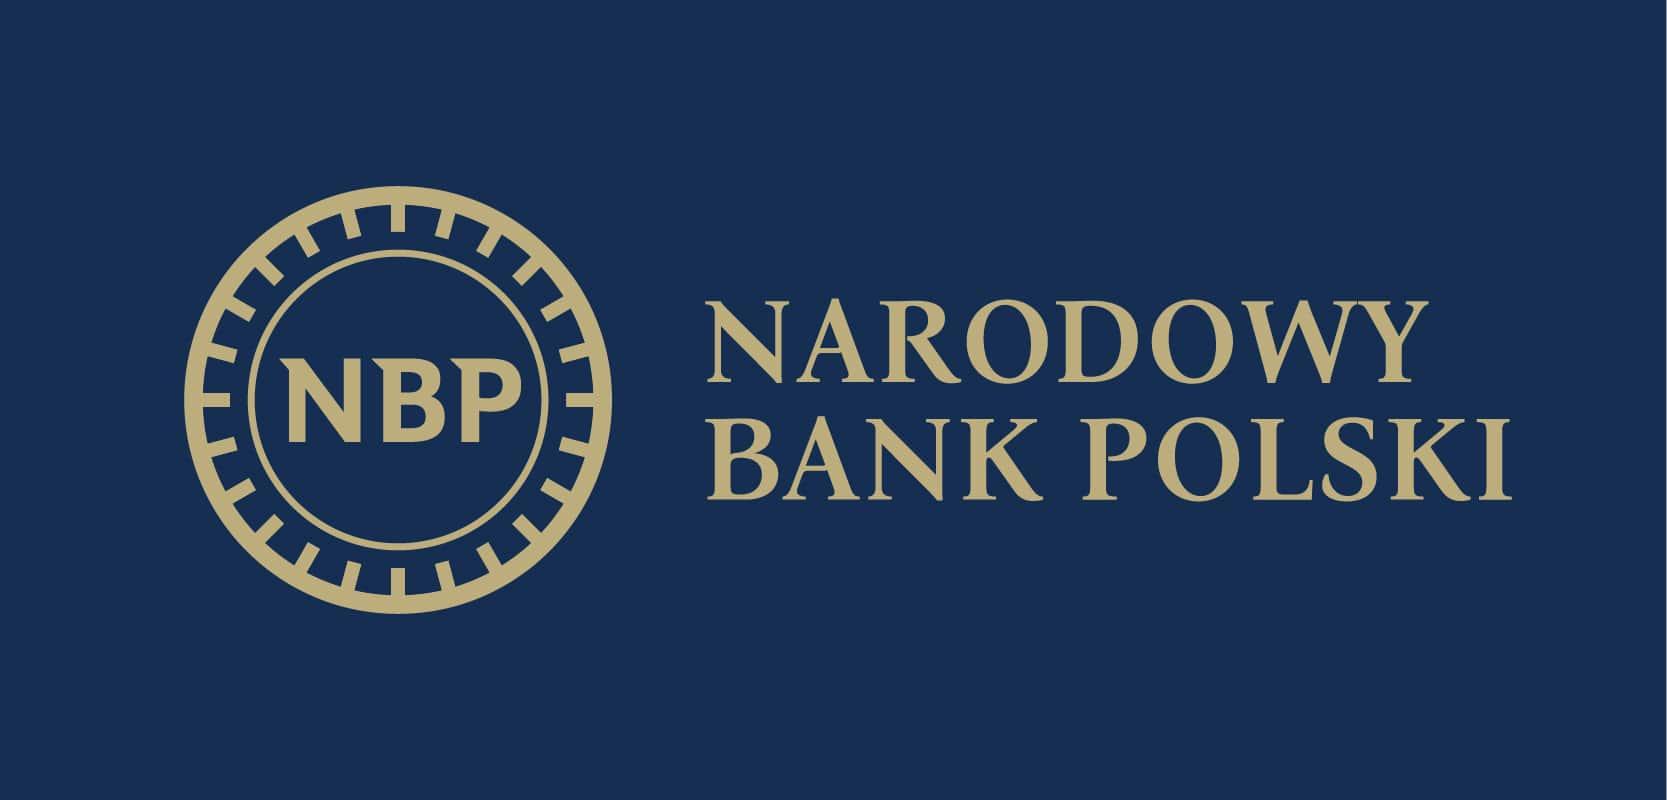 nowe logo NBP (5)